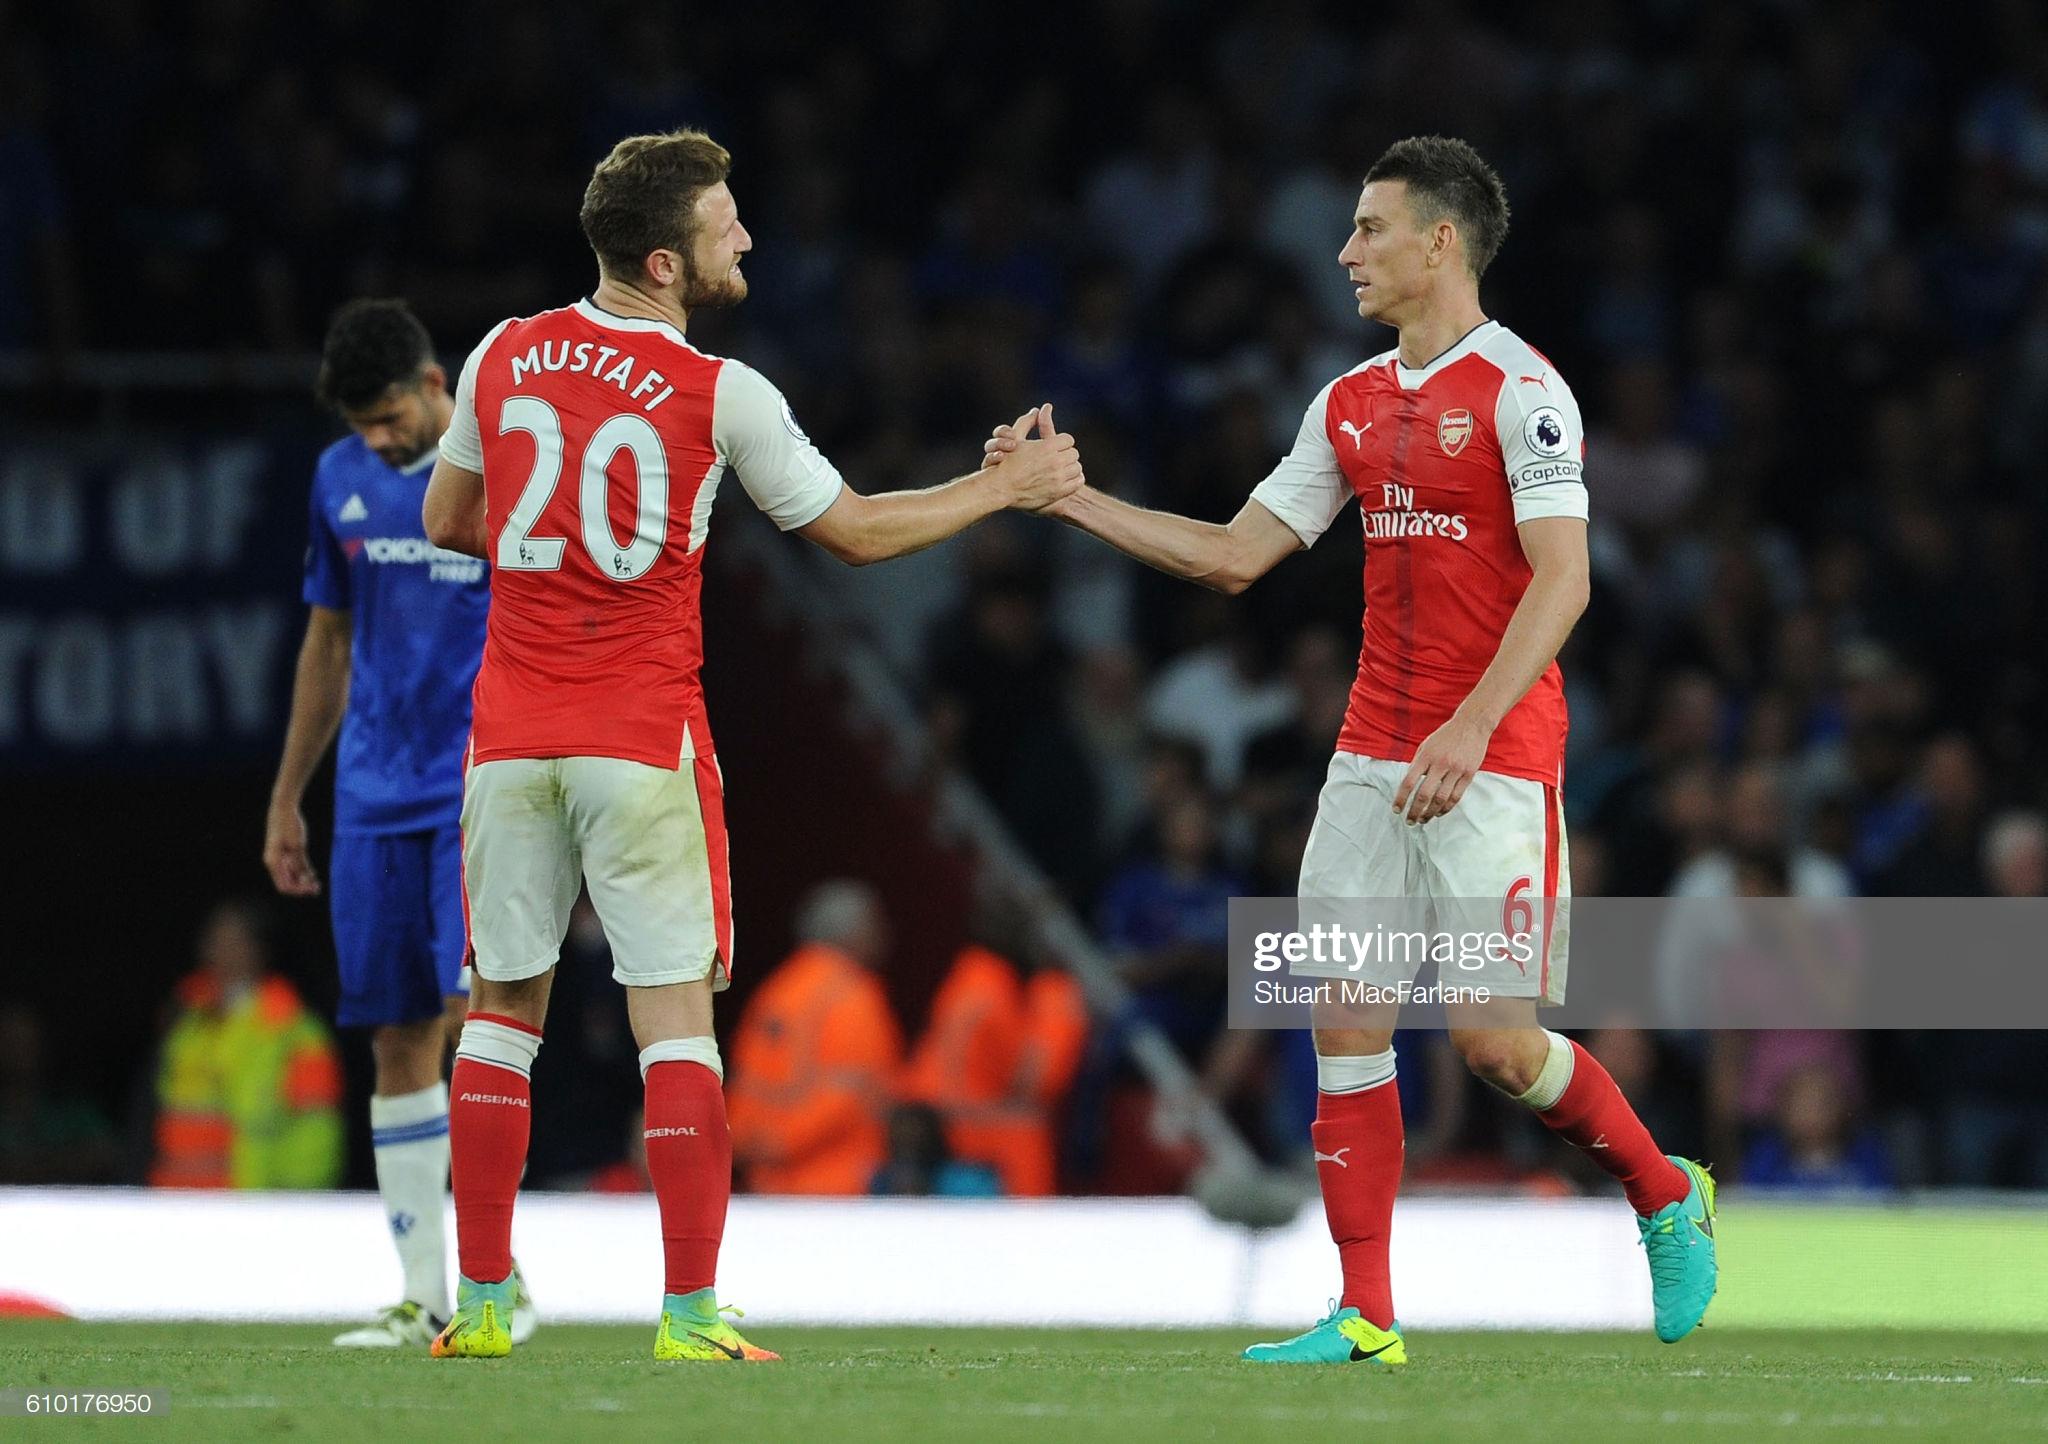 Mustafi et Koscielny face à Chelsea